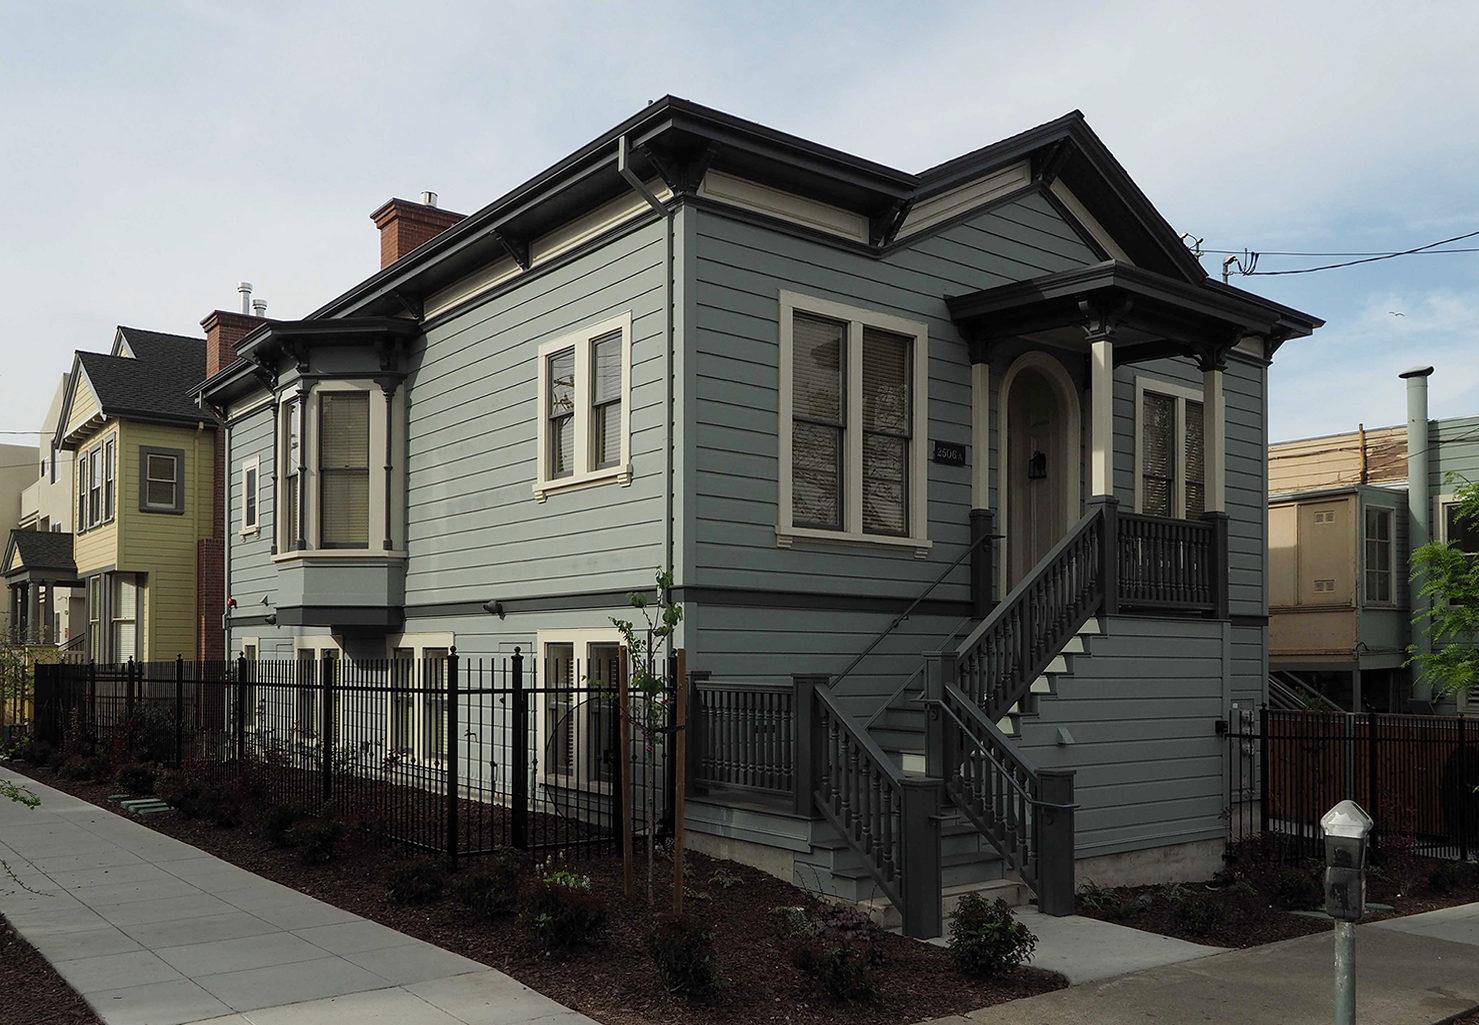 John Woolley House and the Ellen Blood House, Berkeley, California.